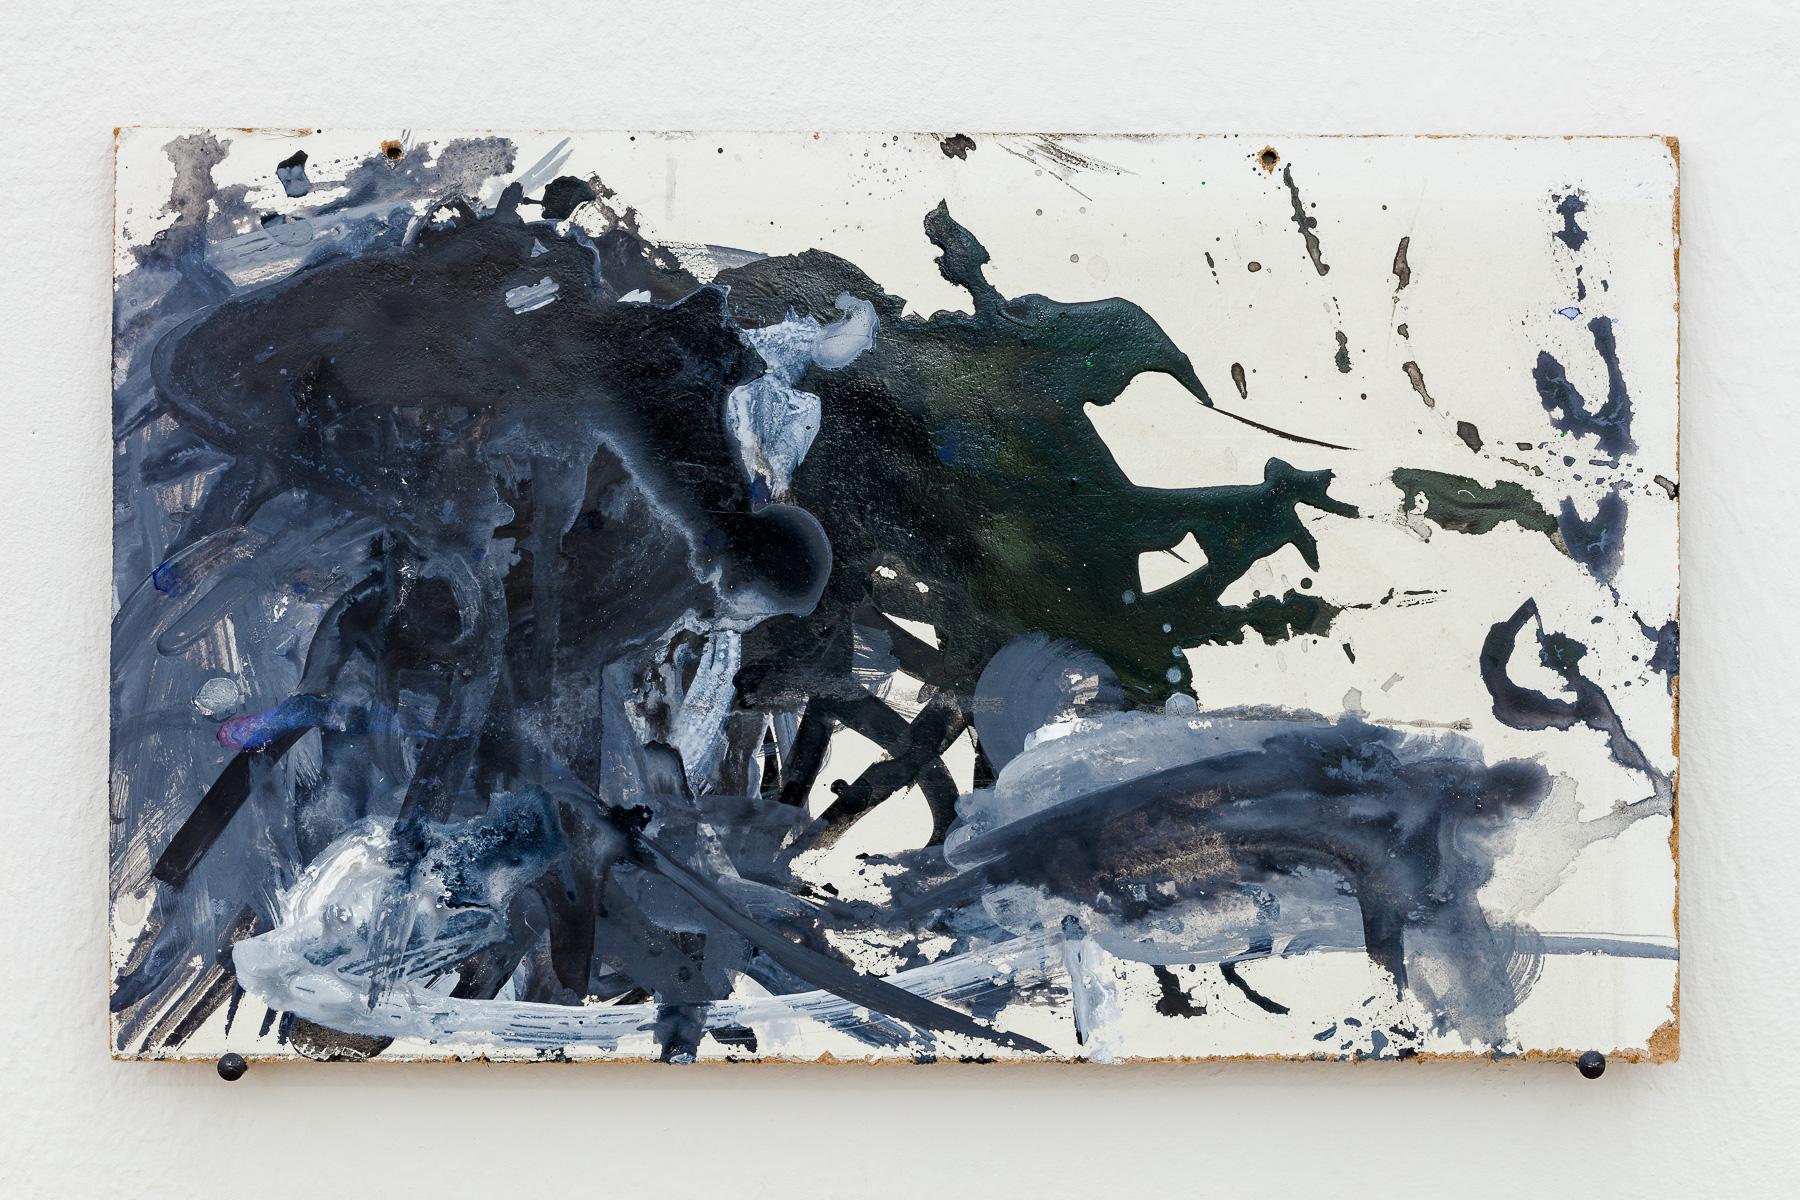 2019_05_20_Elke-Krystufek_Croy-Nielsen_by-kunst-dokumentation-com_008_web.jpg